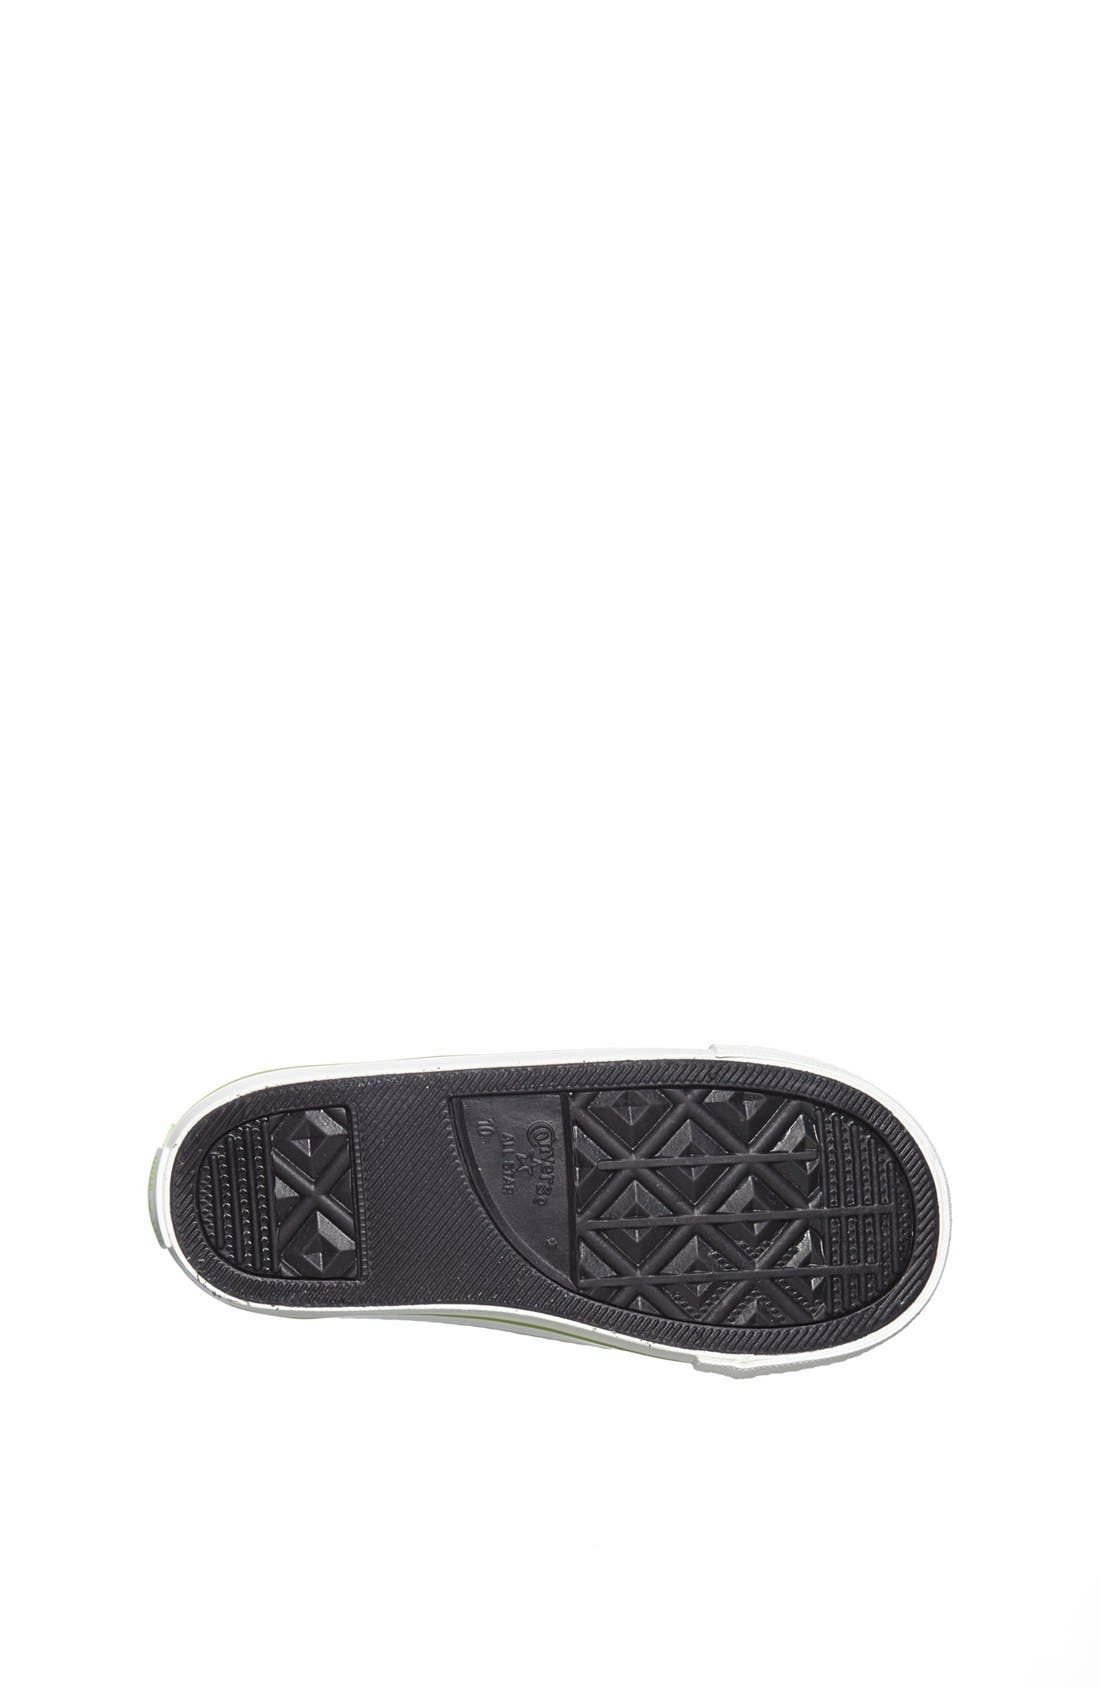 Alternate Image 4  - Converse Chuck Taylor® All Star® 'Kriss N Kross' Sneaker (Toddler, Little Kid & Big Kid)